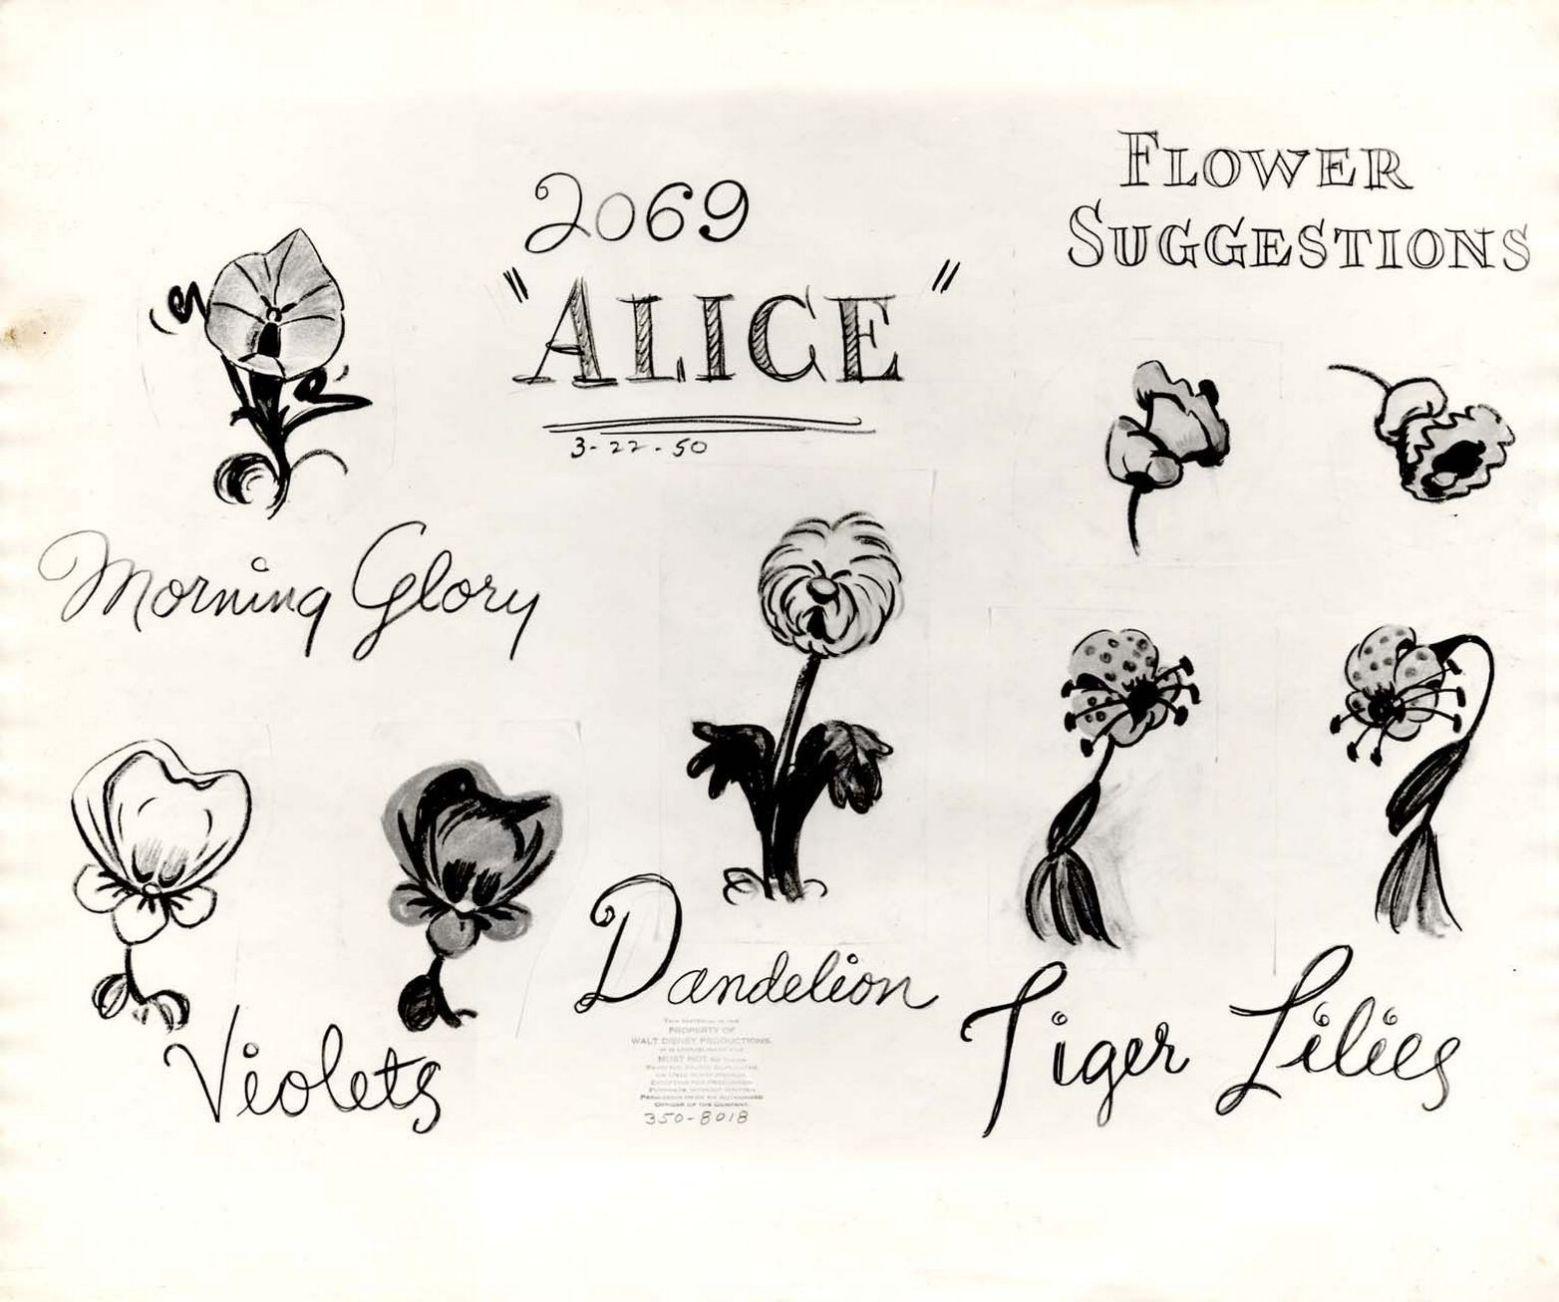 Alice In Wonderland Flowers Tattoo Ideas 3 Alice In Wonderland Flowers Alice And Wonderland Tattoos Wonderland Tattoo